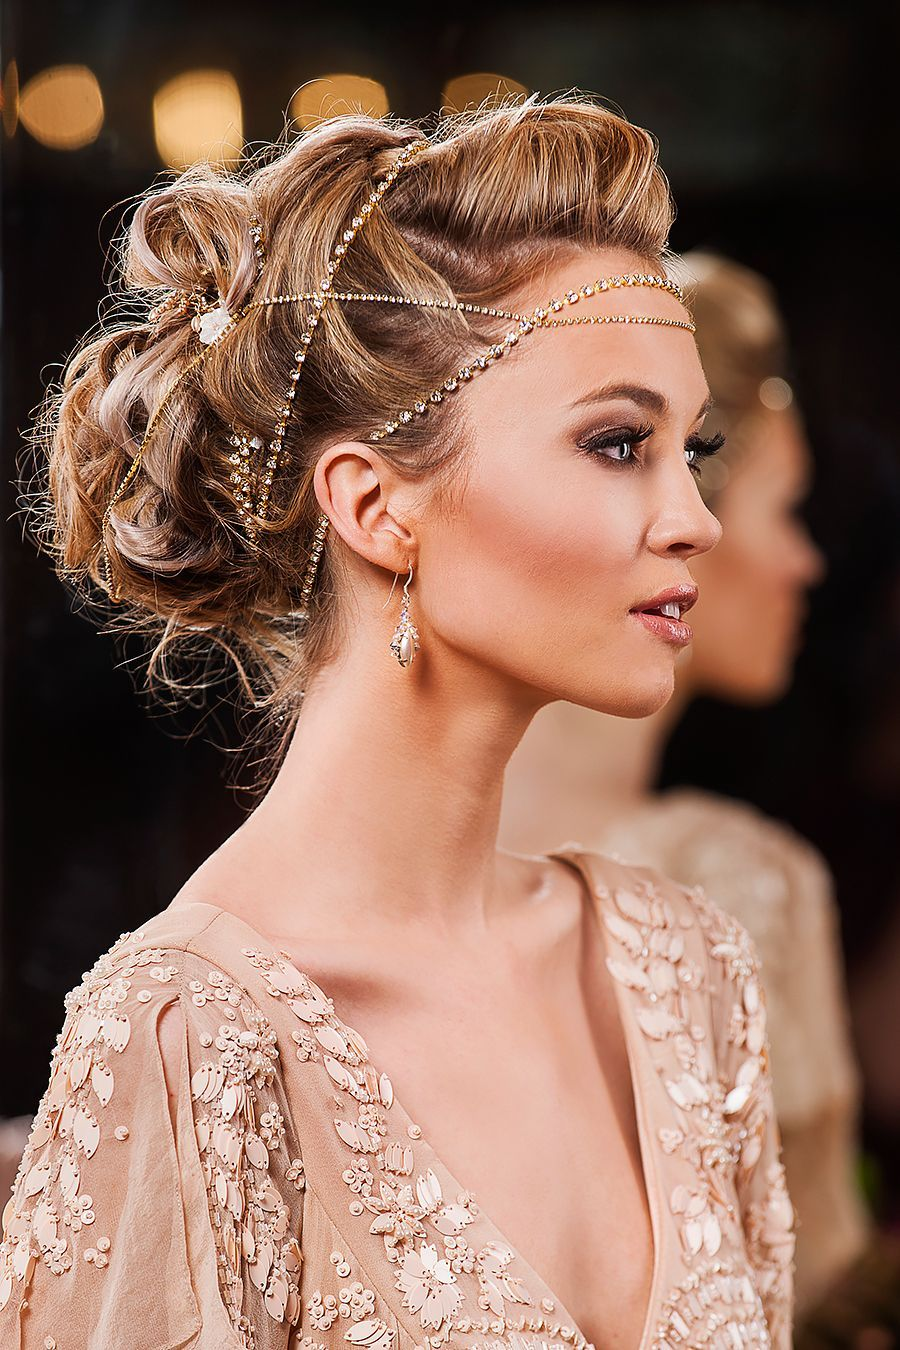 Luxury wedding accessories wedding accessories headpieces and